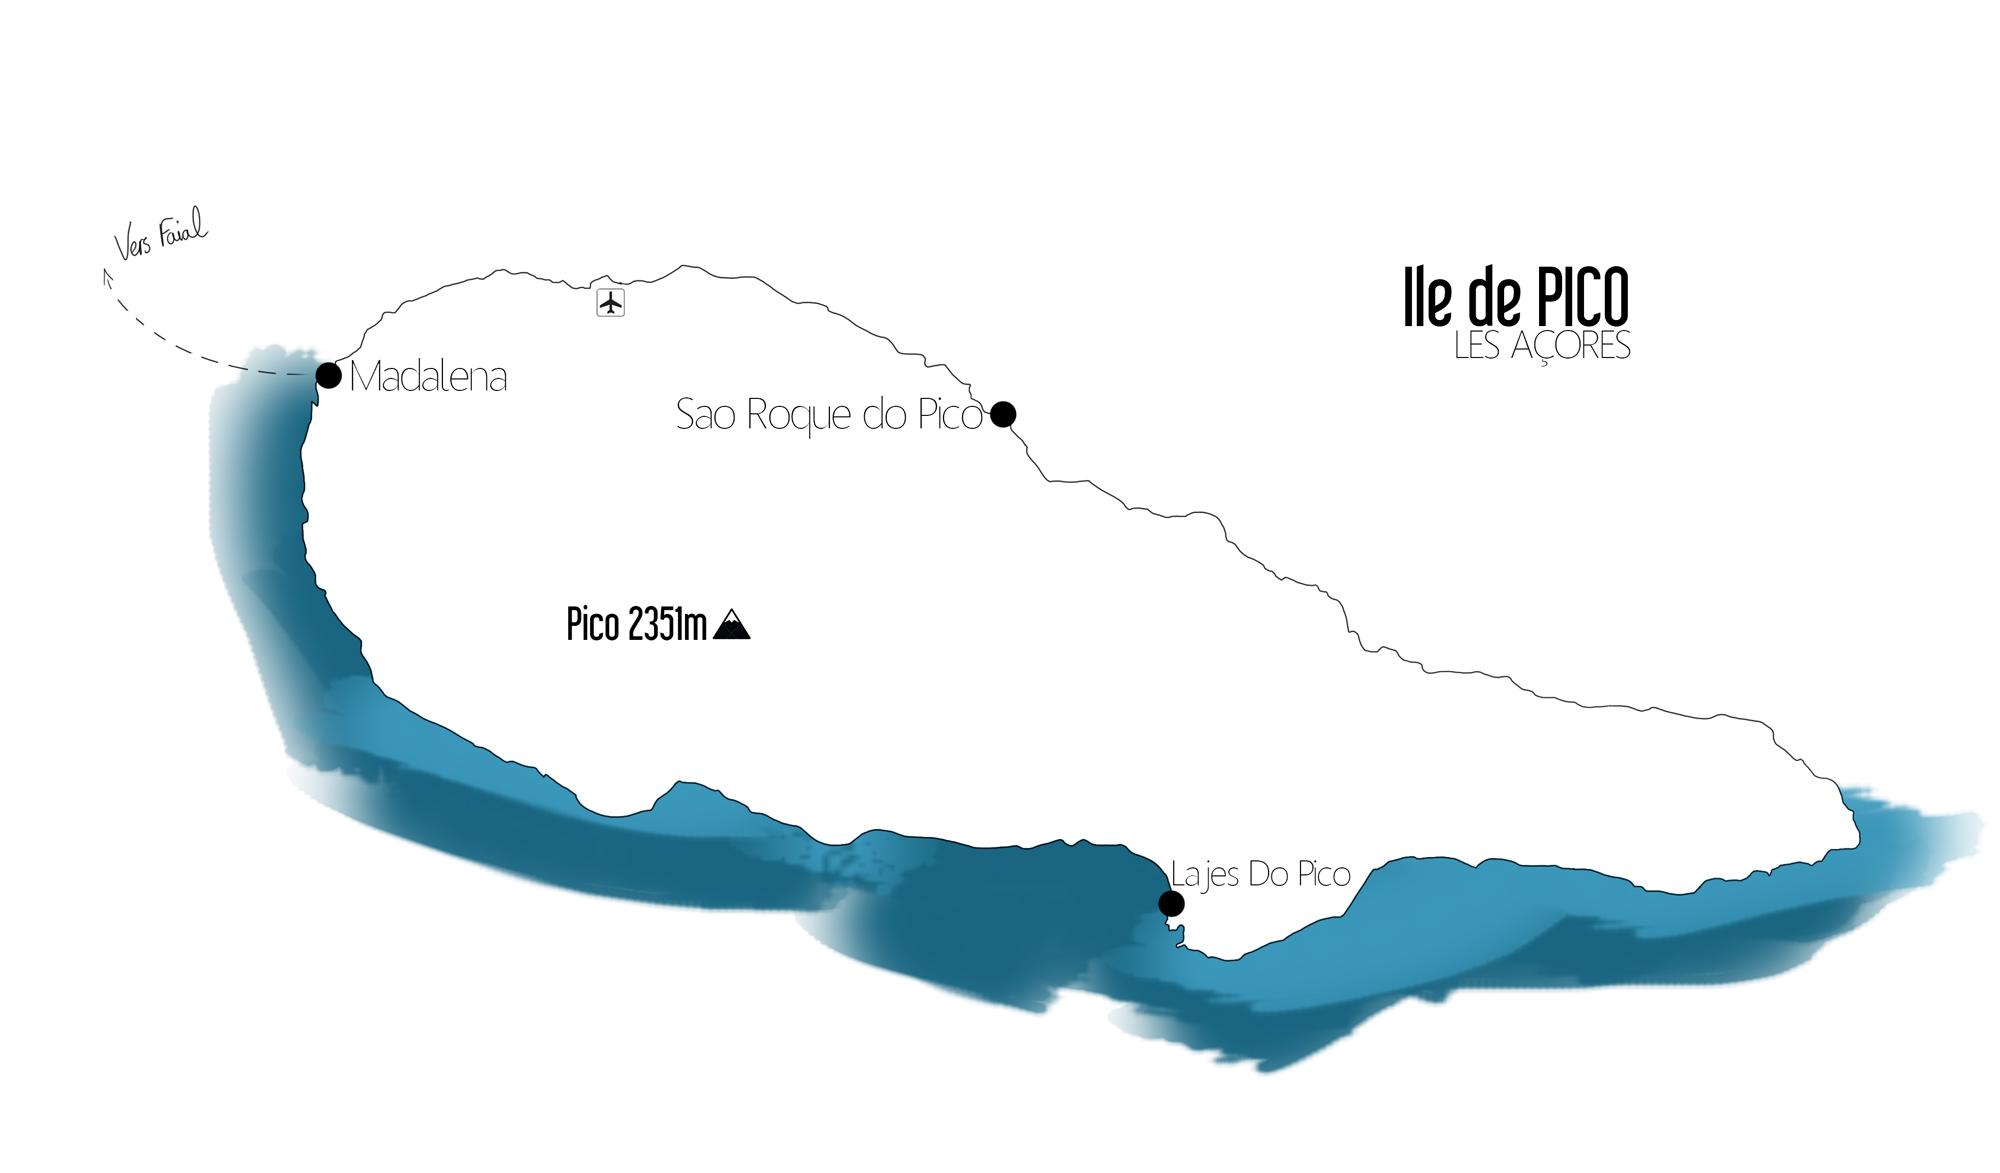 Carte Ile de Pico, Les Açores